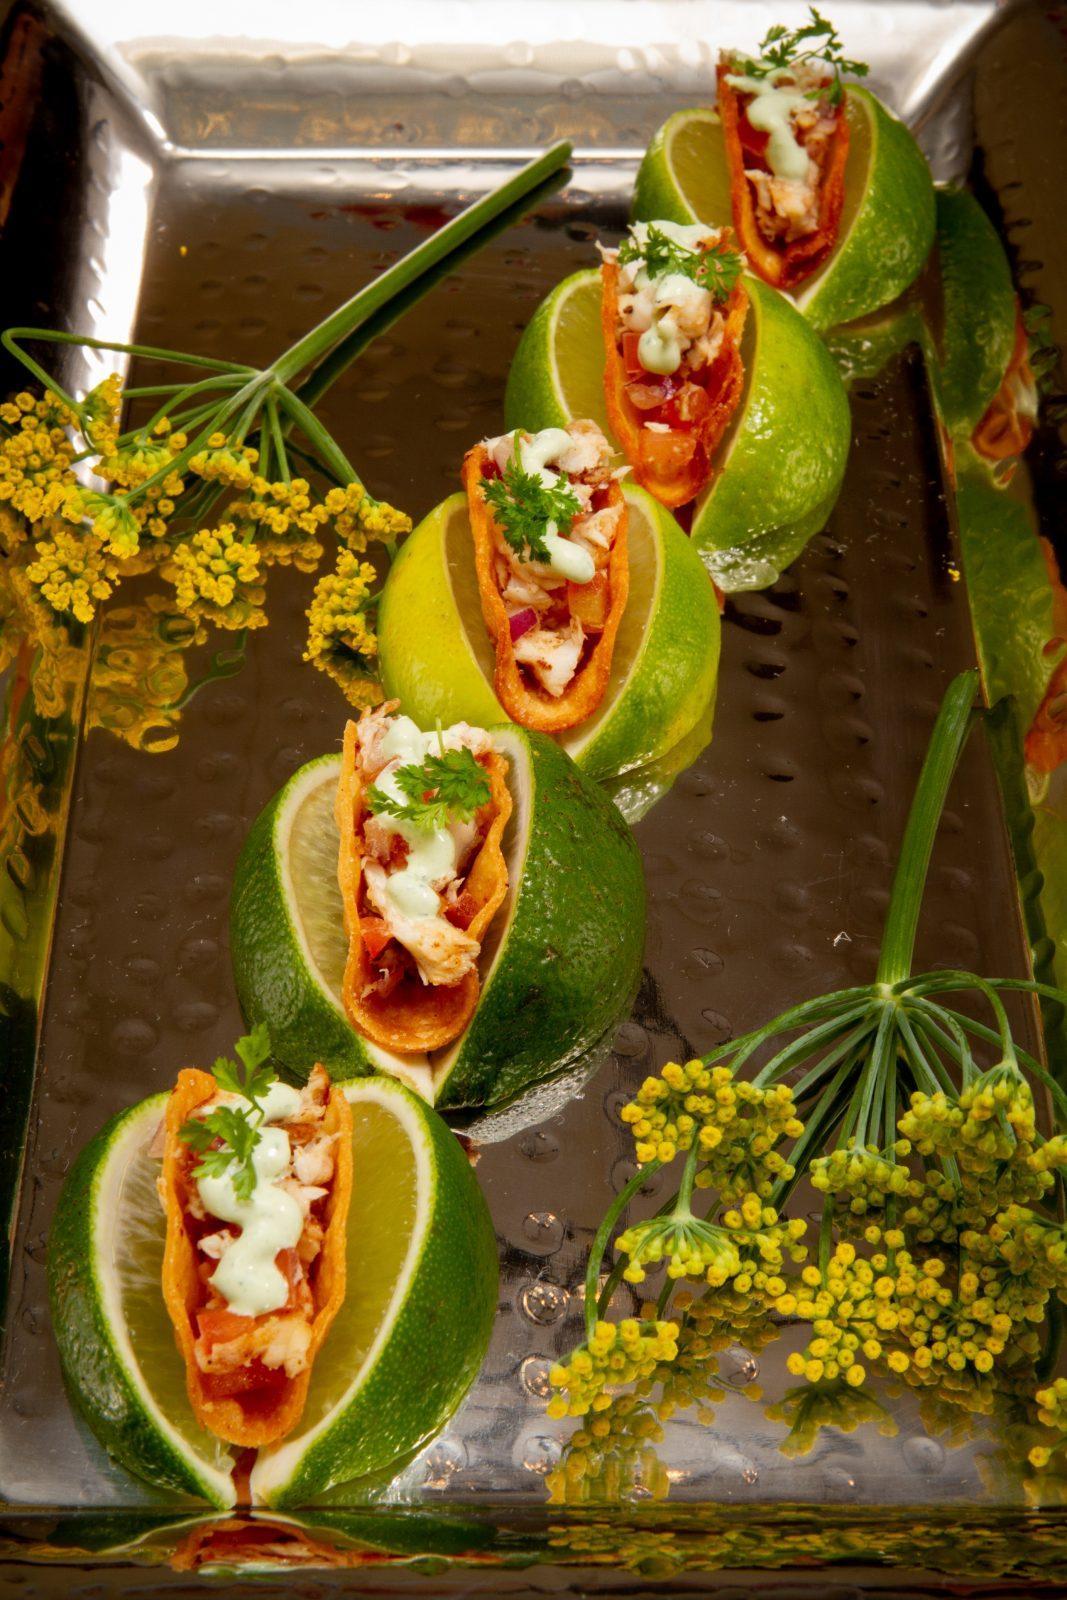 Mini tacos by Marie's Fleur De Lis Catering. Photo: Jessica The Photographer